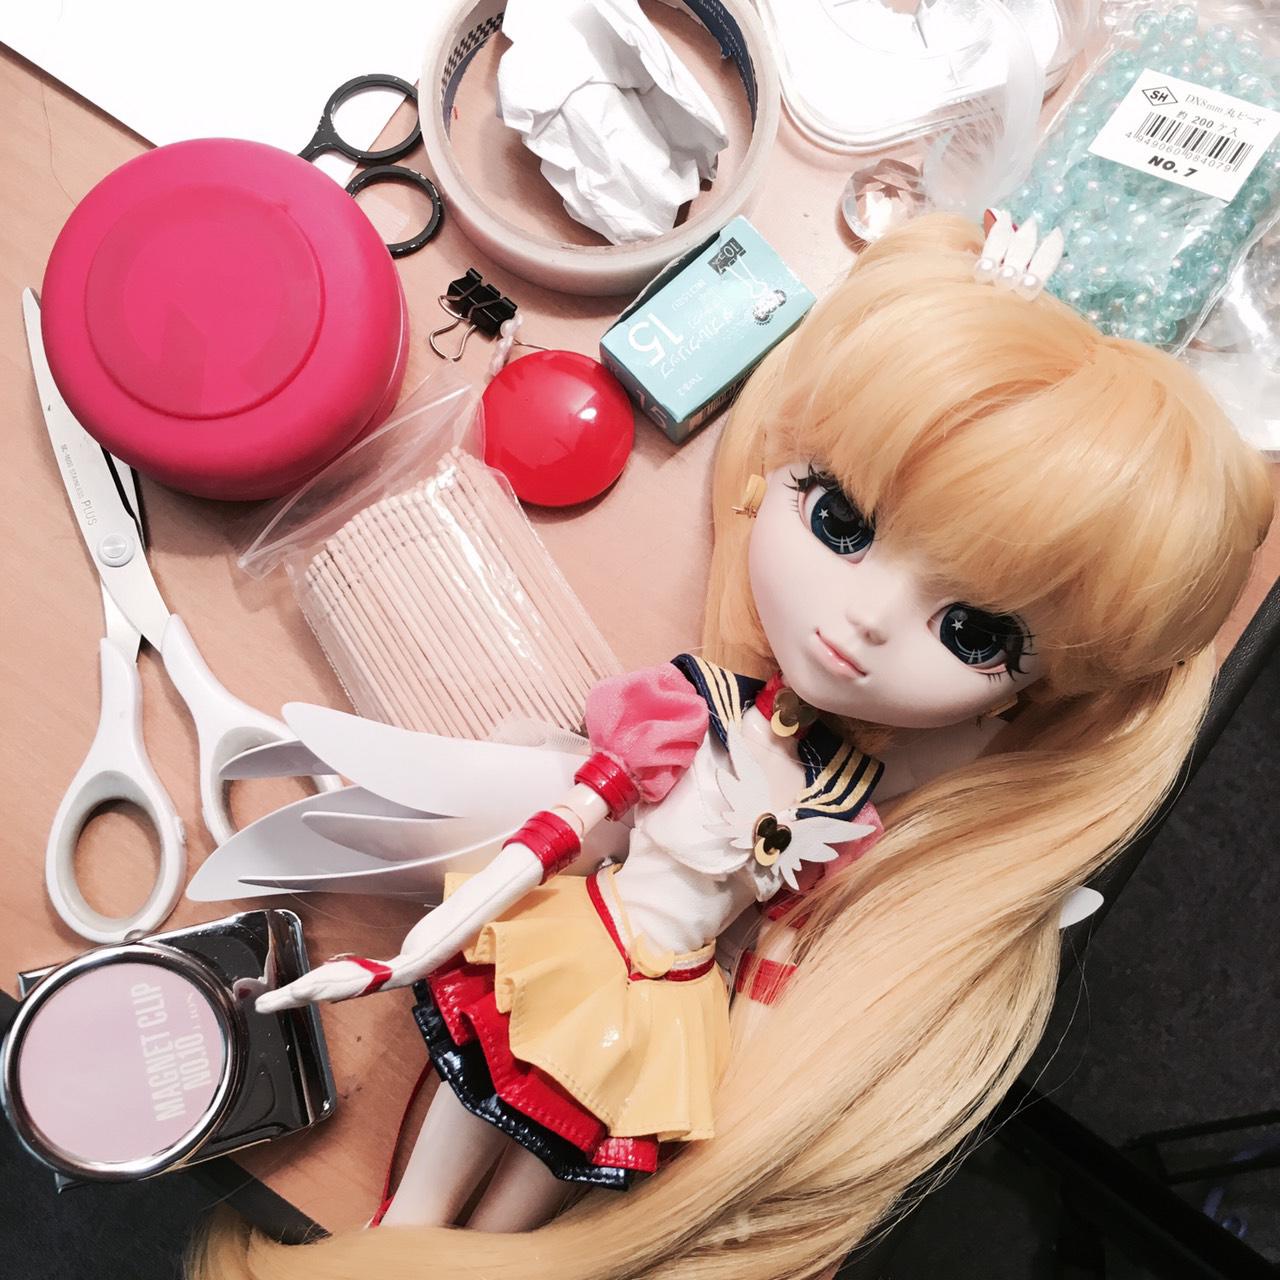 fujisato_170628_06.jpg